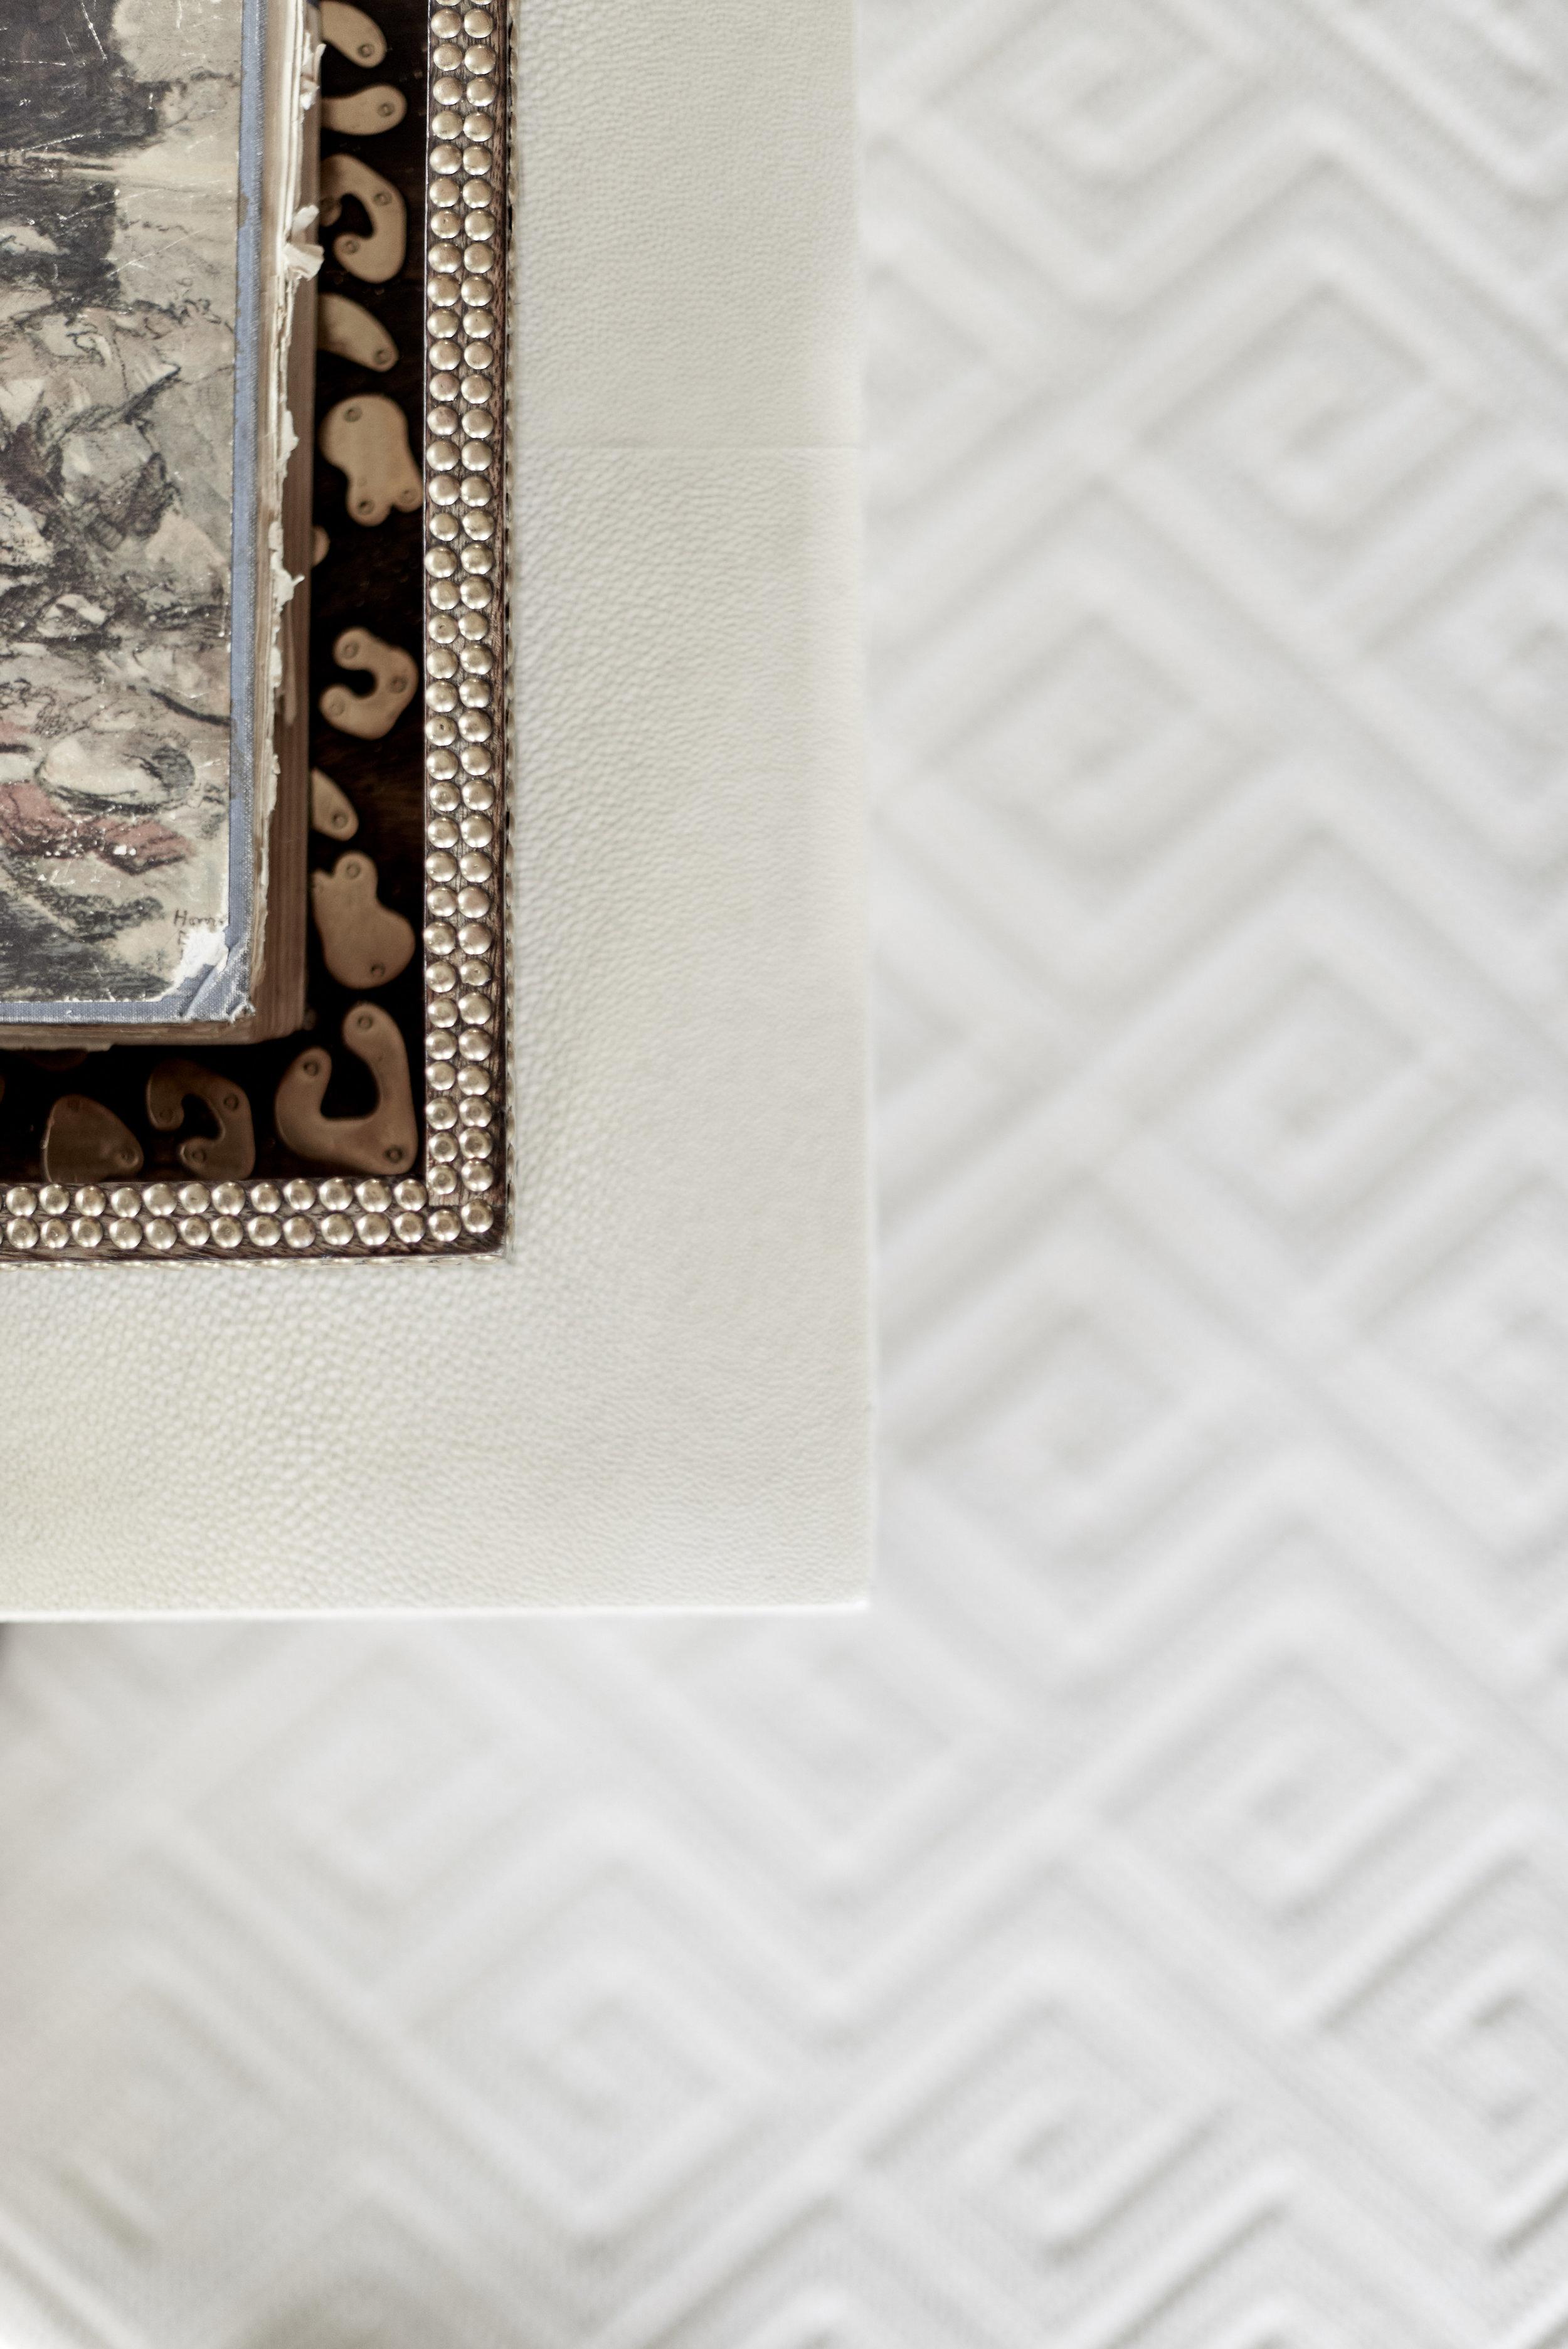 scmurphyllc_Living_room_table_detail.jpg